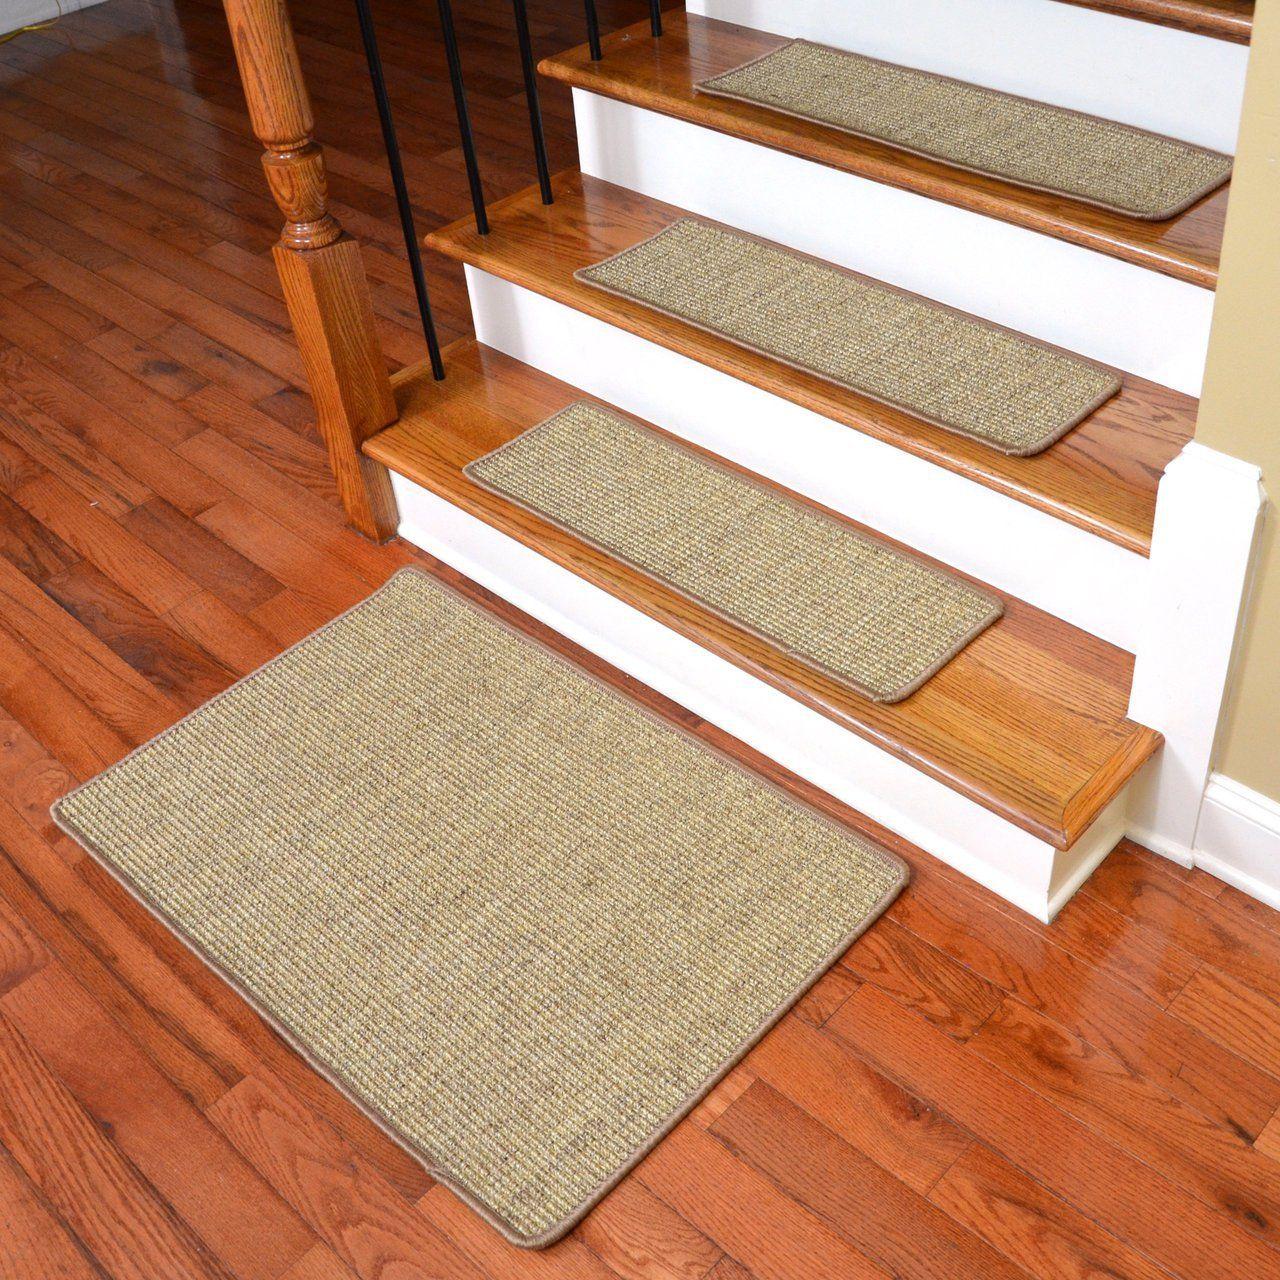 Best Dean Attachable Non Skid Sisal Carpet Stair Treads 400 x 300